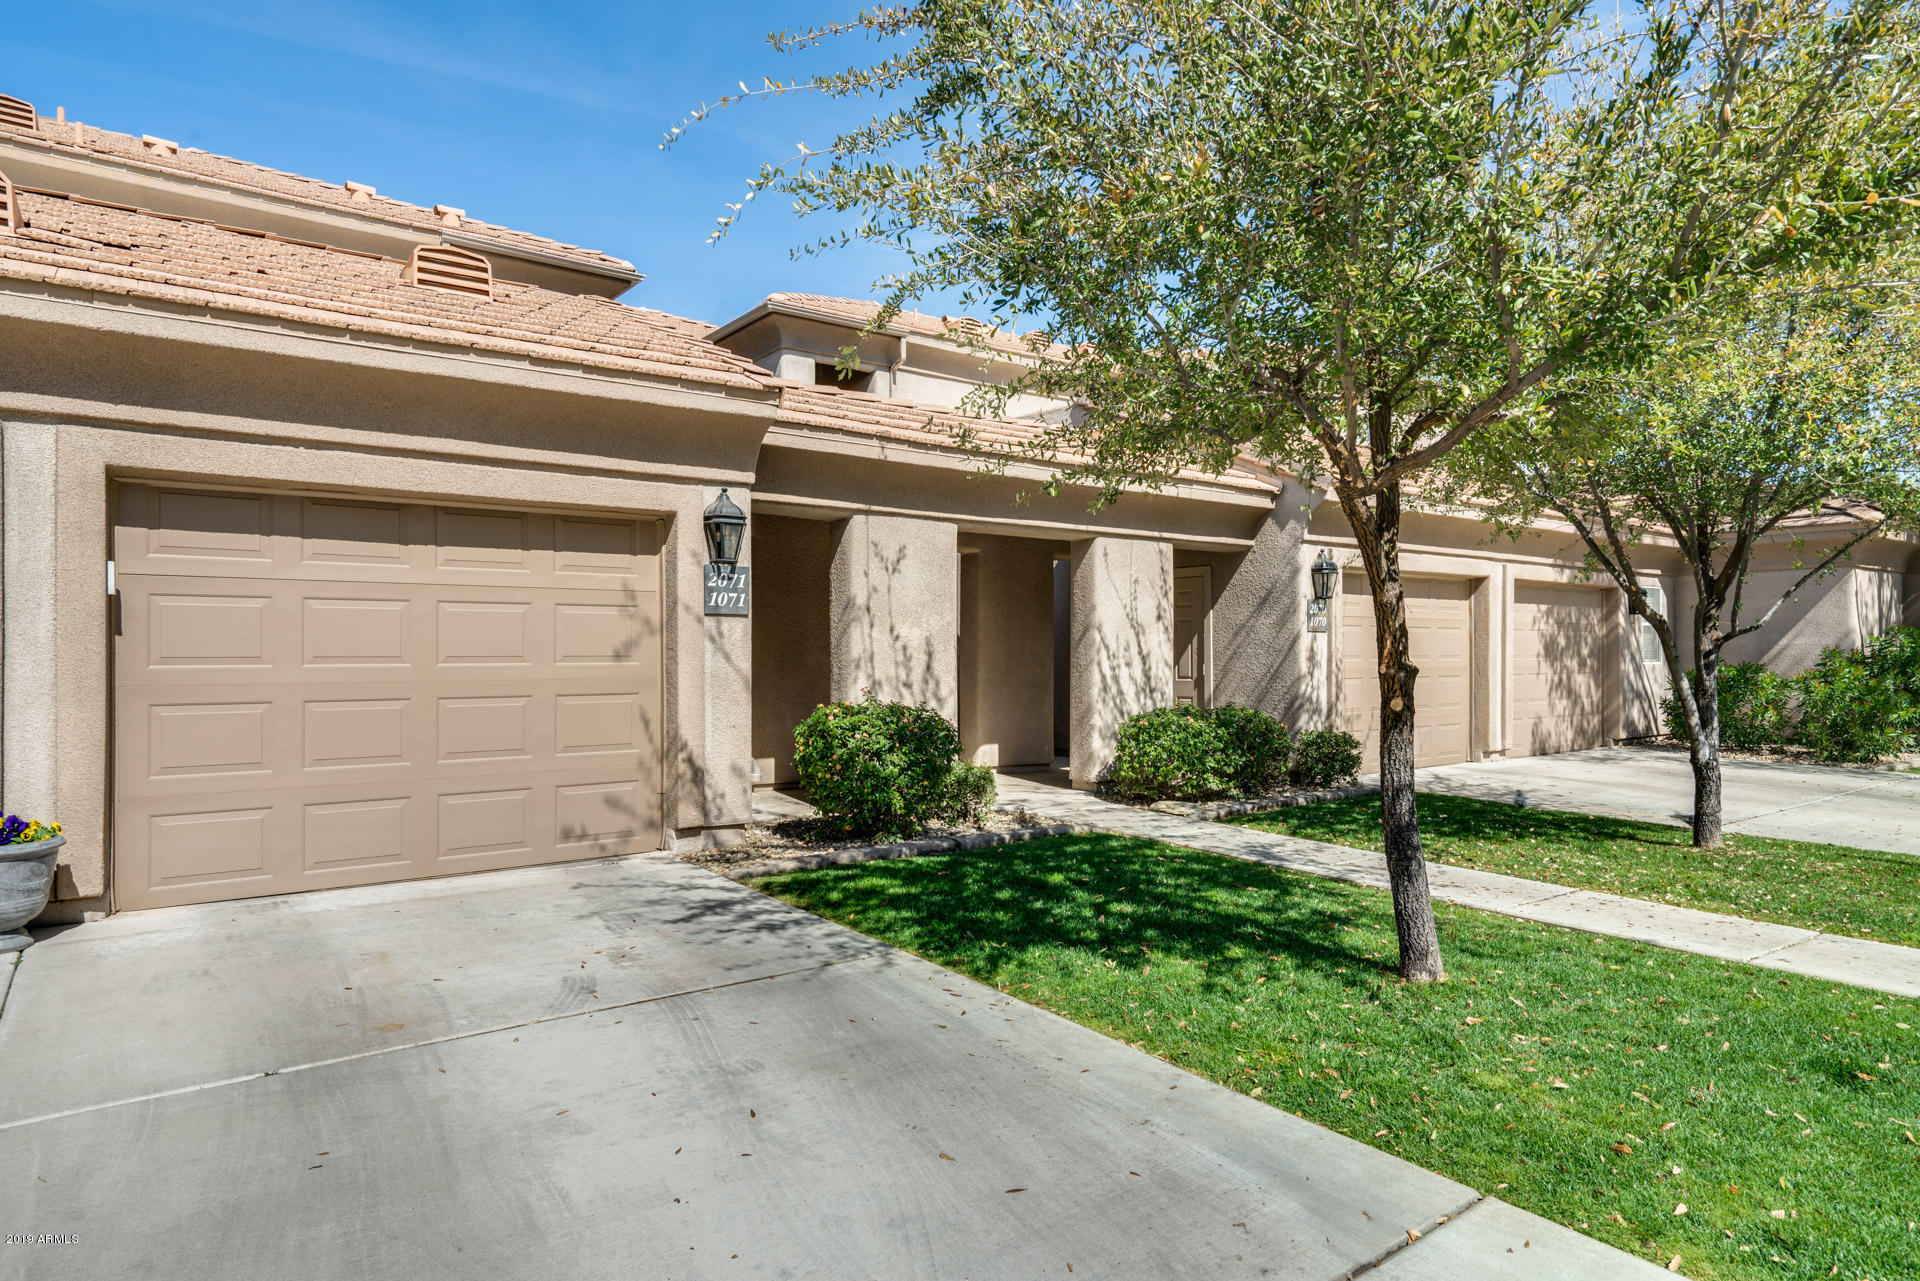 Photo of 7401 W ARROWHEAD CLUBHOUSE Drive #2071, Glendale, AZ 85308